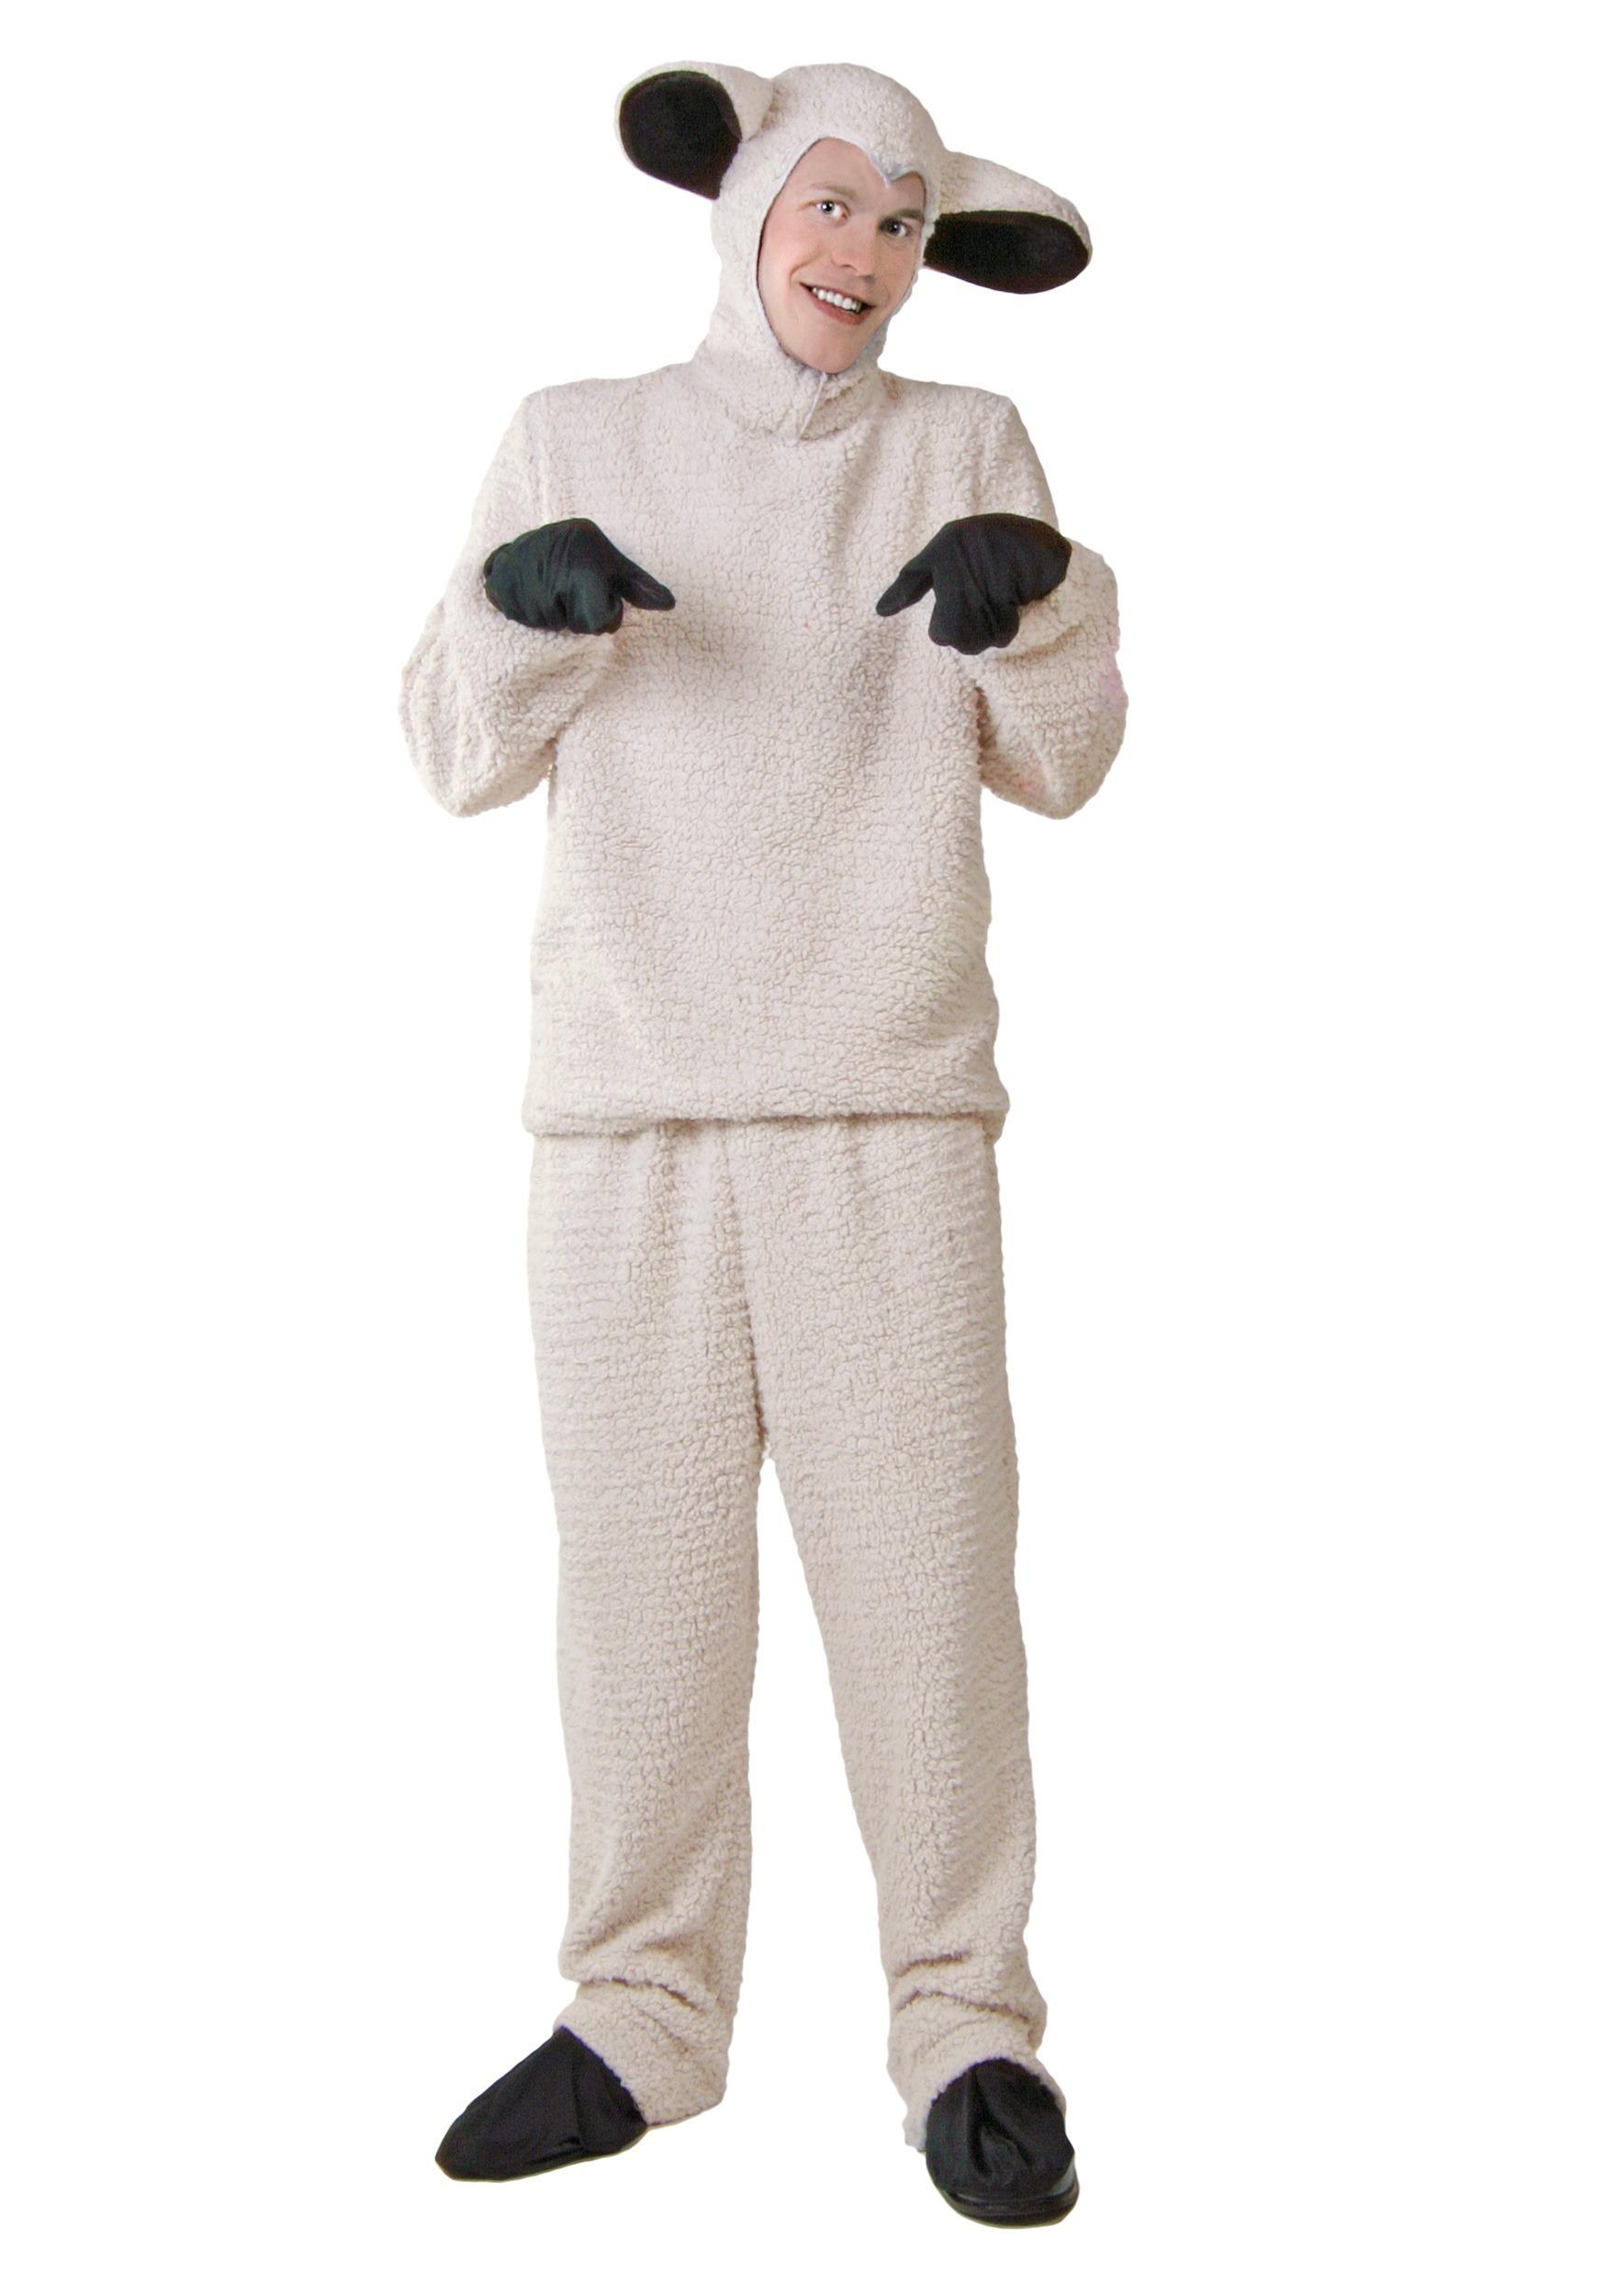 Little bo peep costumes plus size sheep costume solutioingenieria Image collections